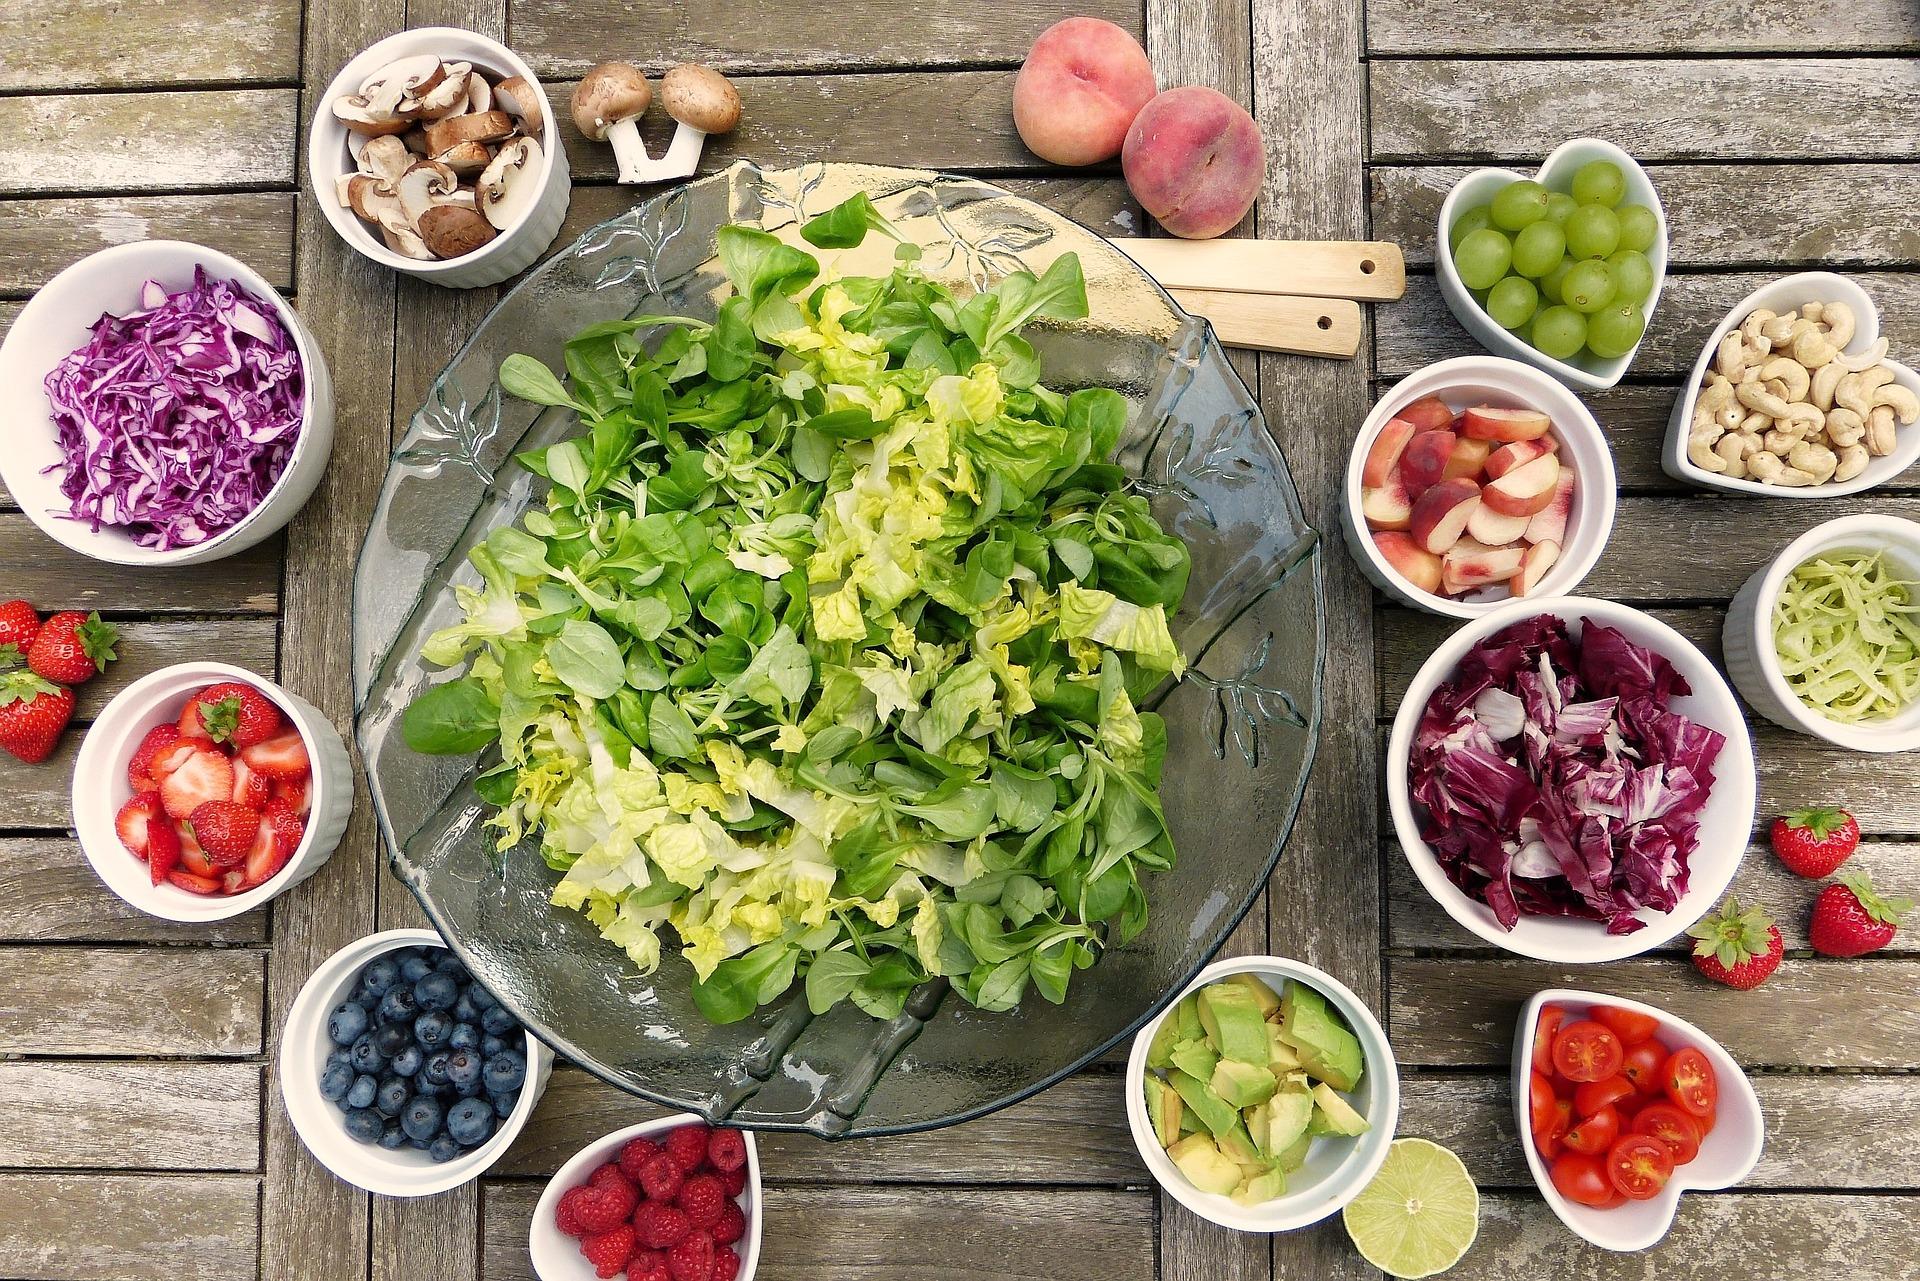 Risultati immagini per dieta detox